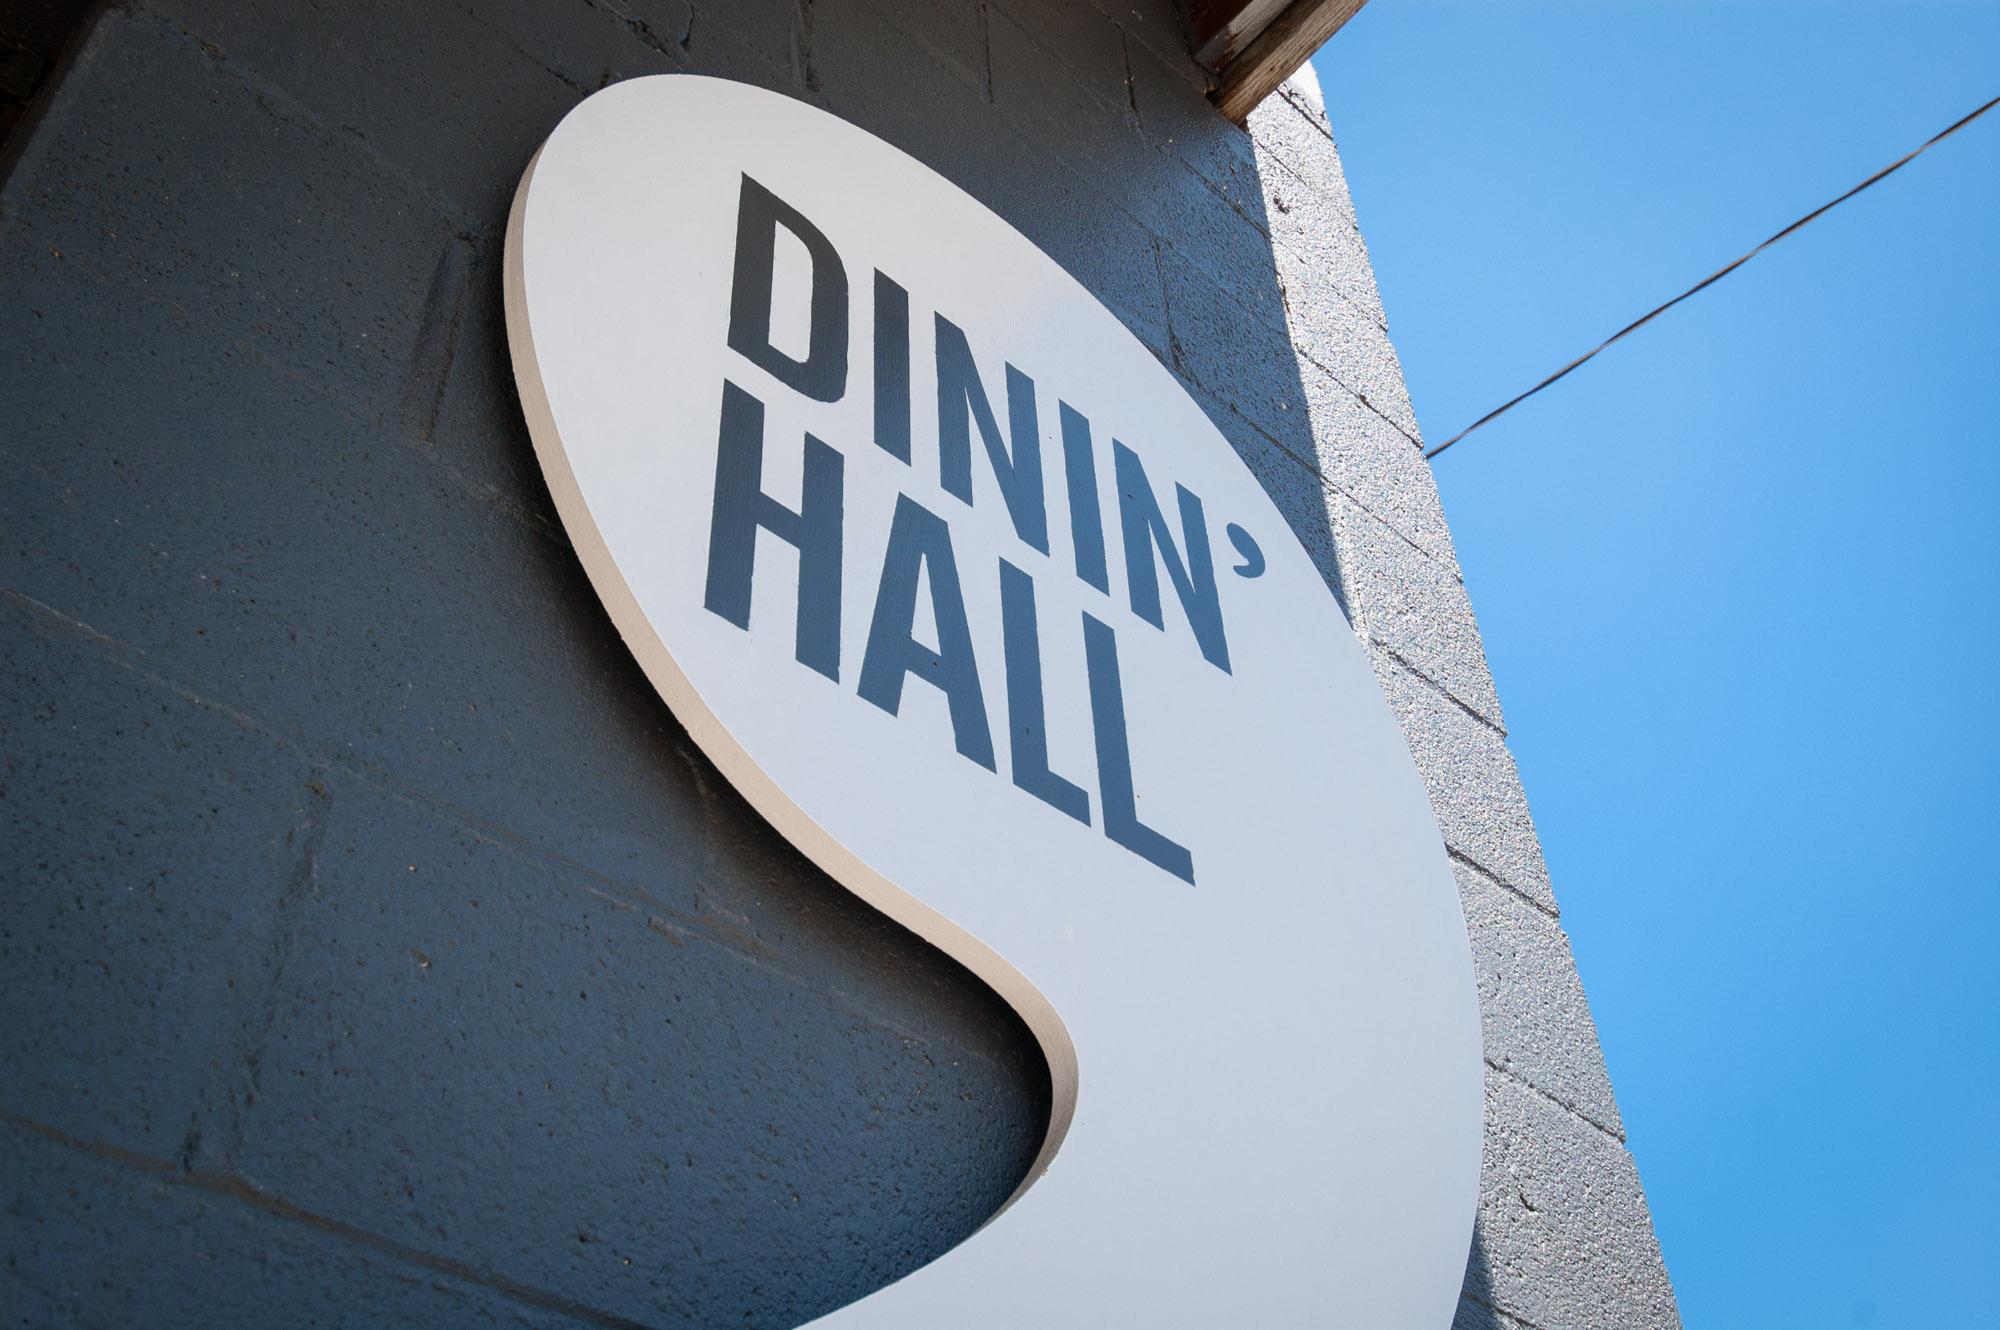 Dinin' Hall